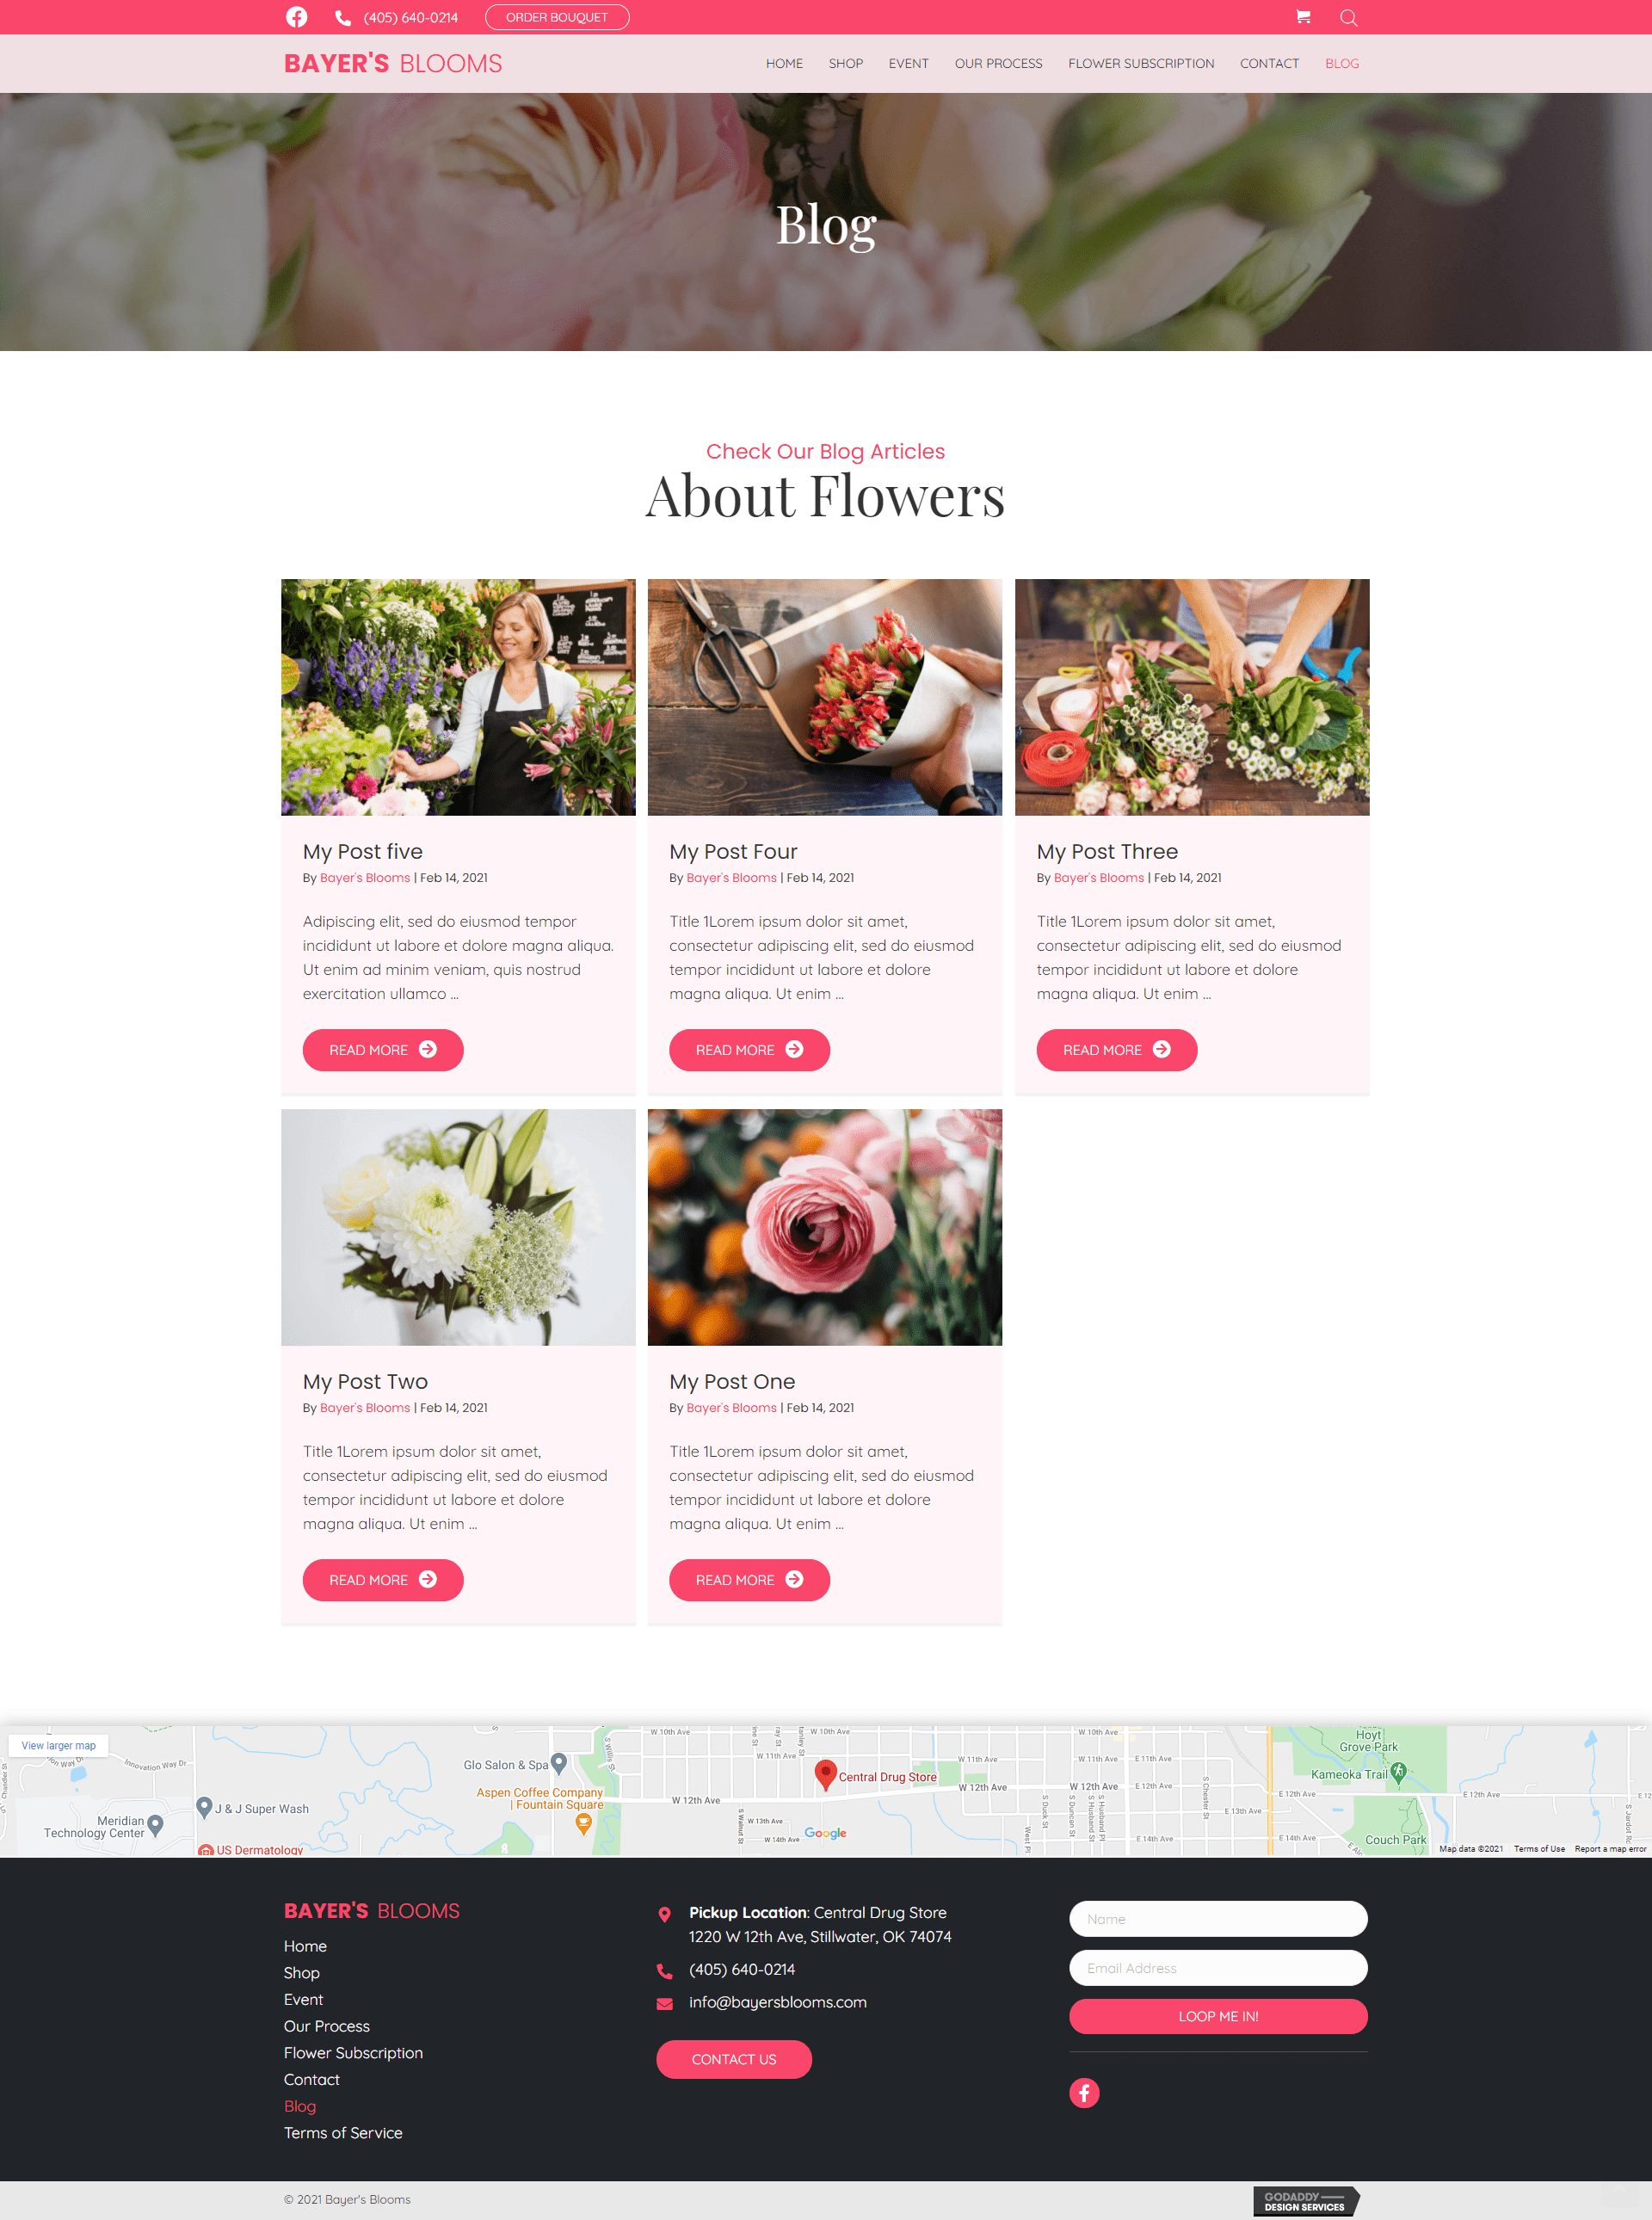 Bayer's Blooms blog